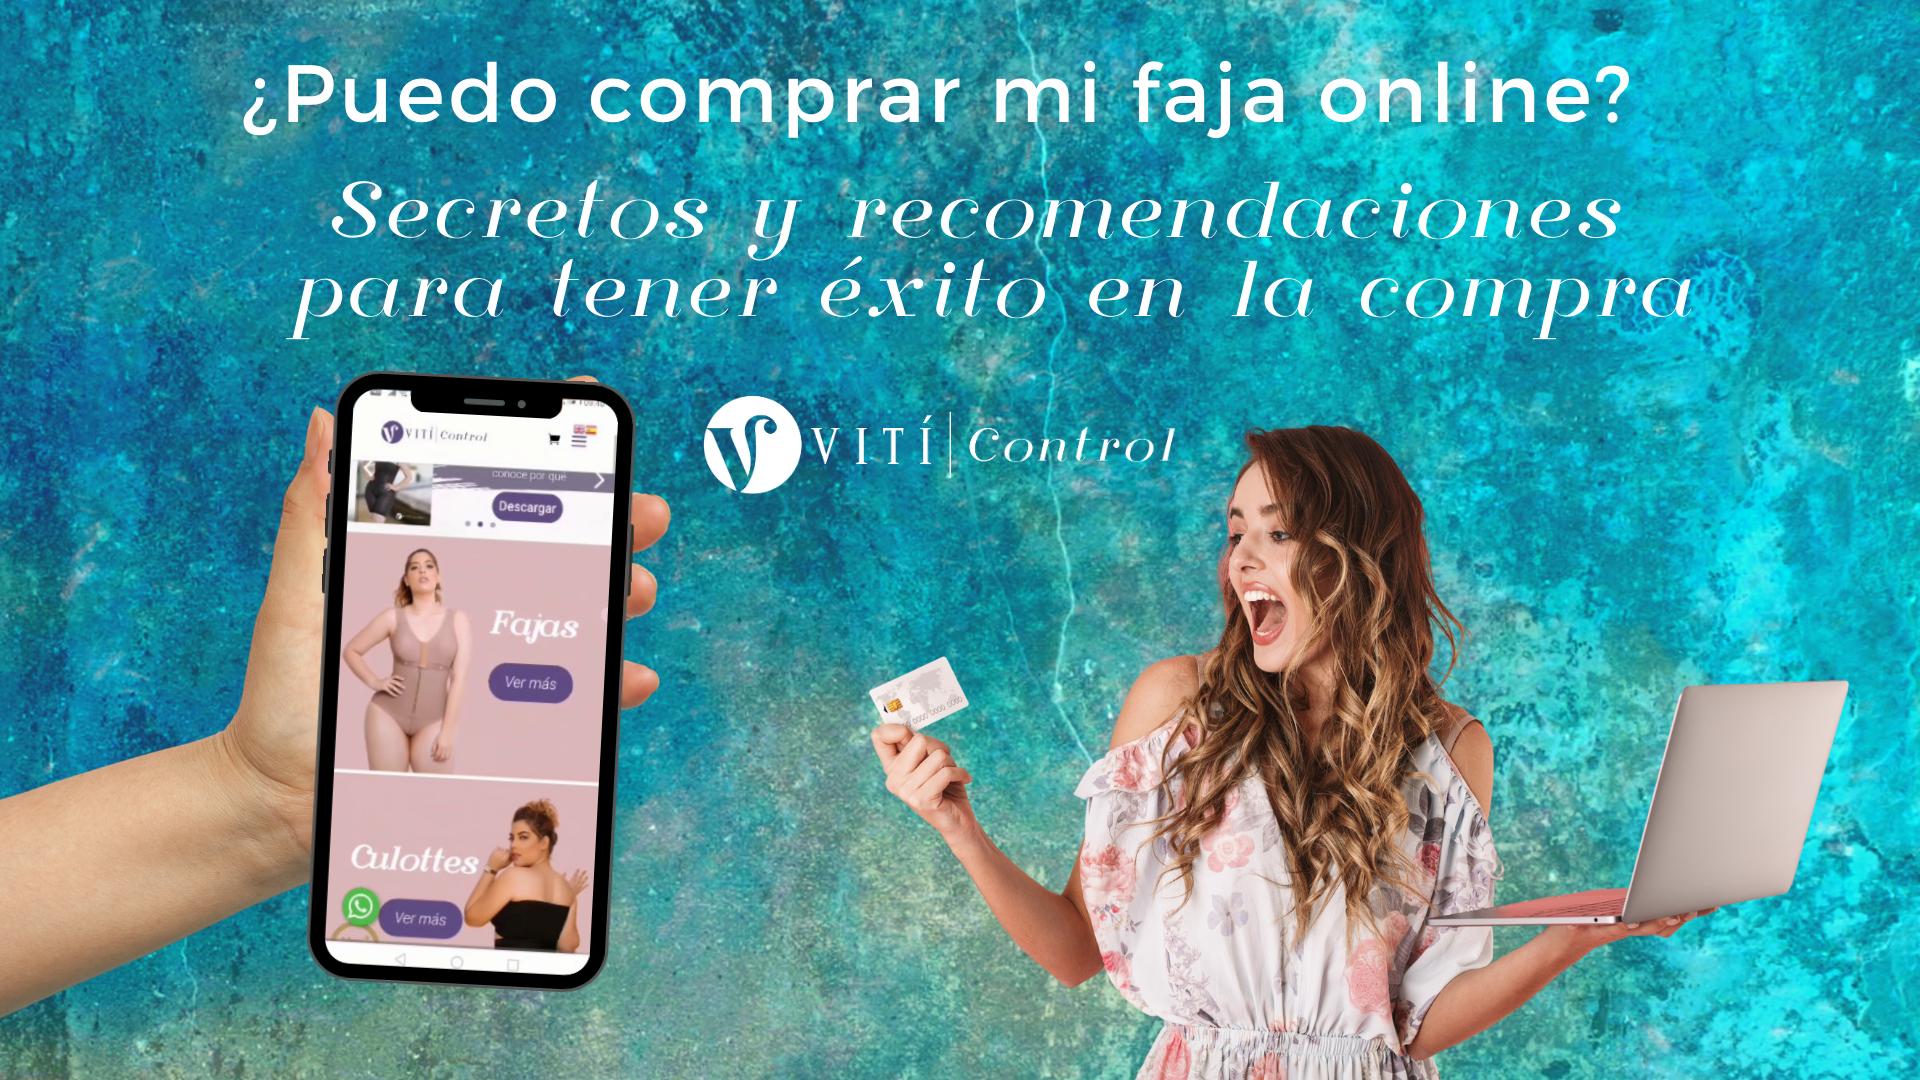 comprar faja online en colombia